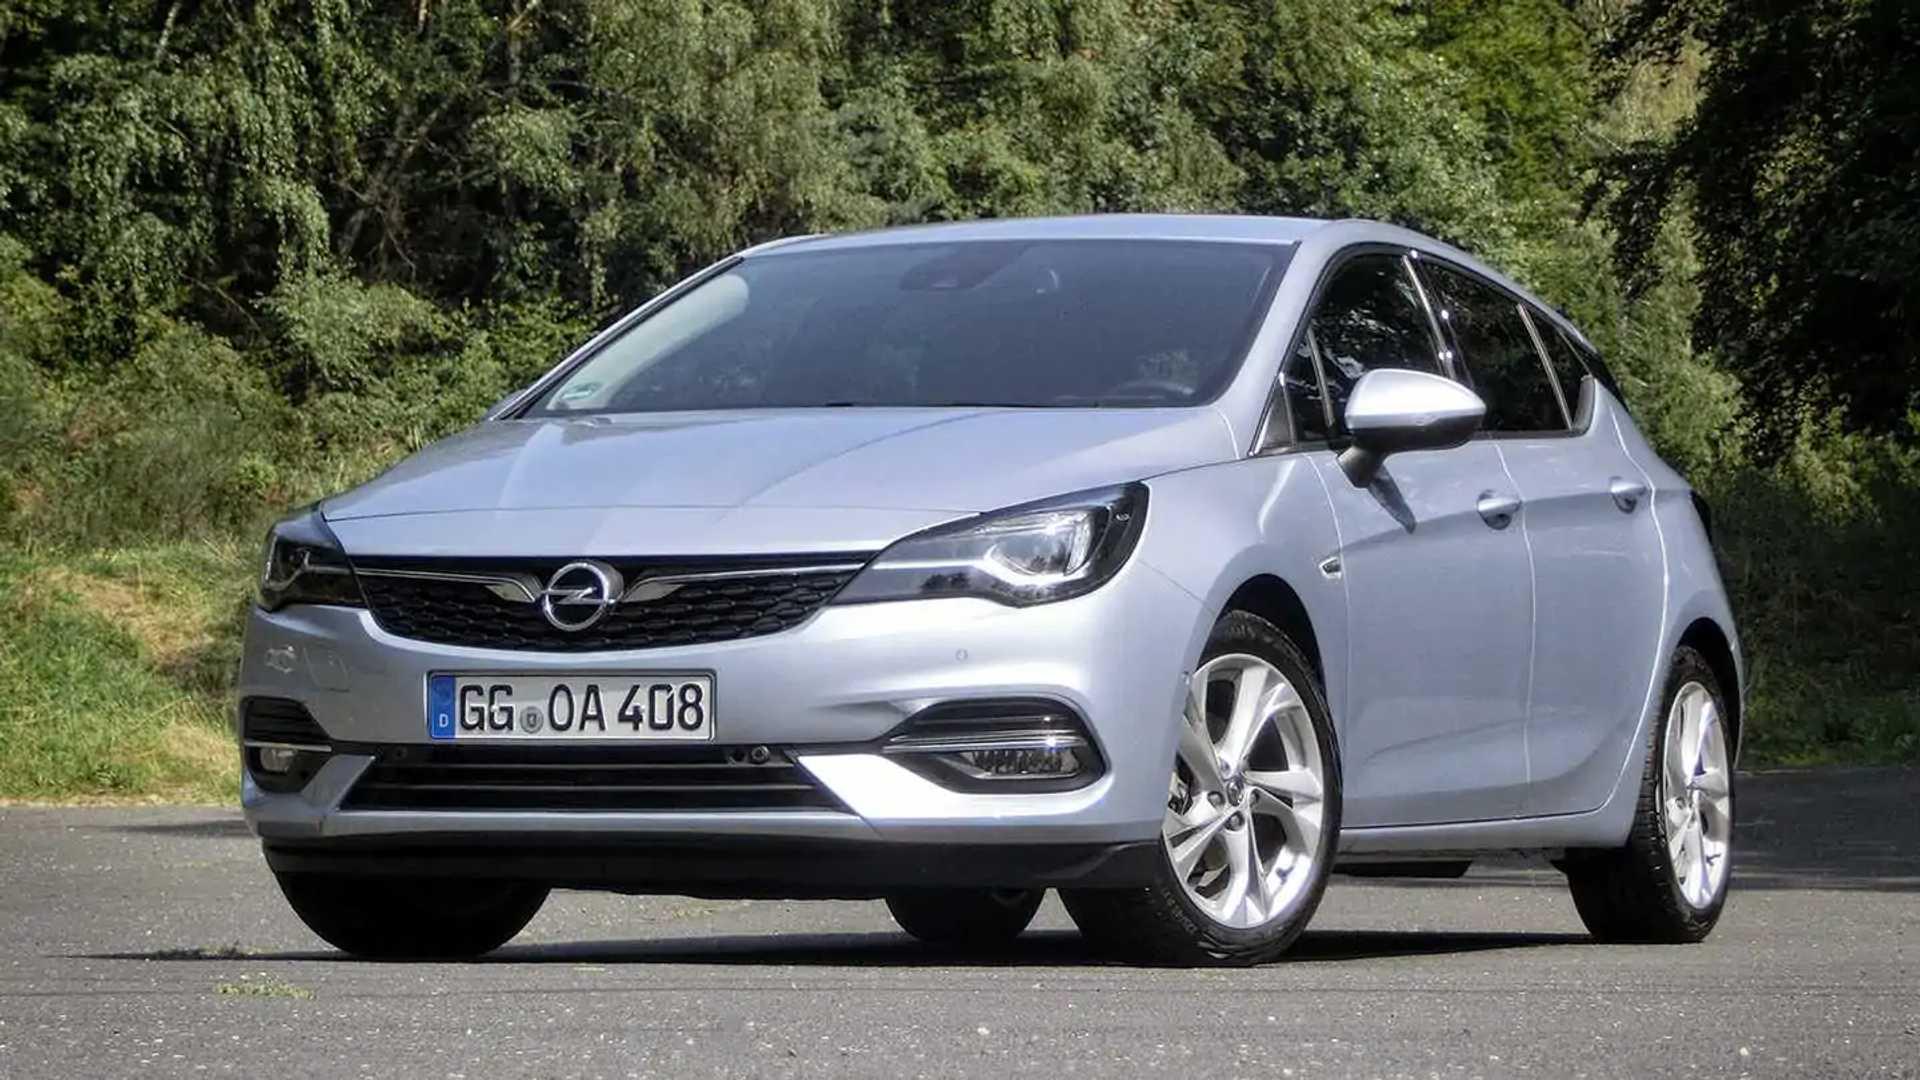 Opel Astra Facelift (2019): Mit neuem 1,2-Liter-Turbo im Test